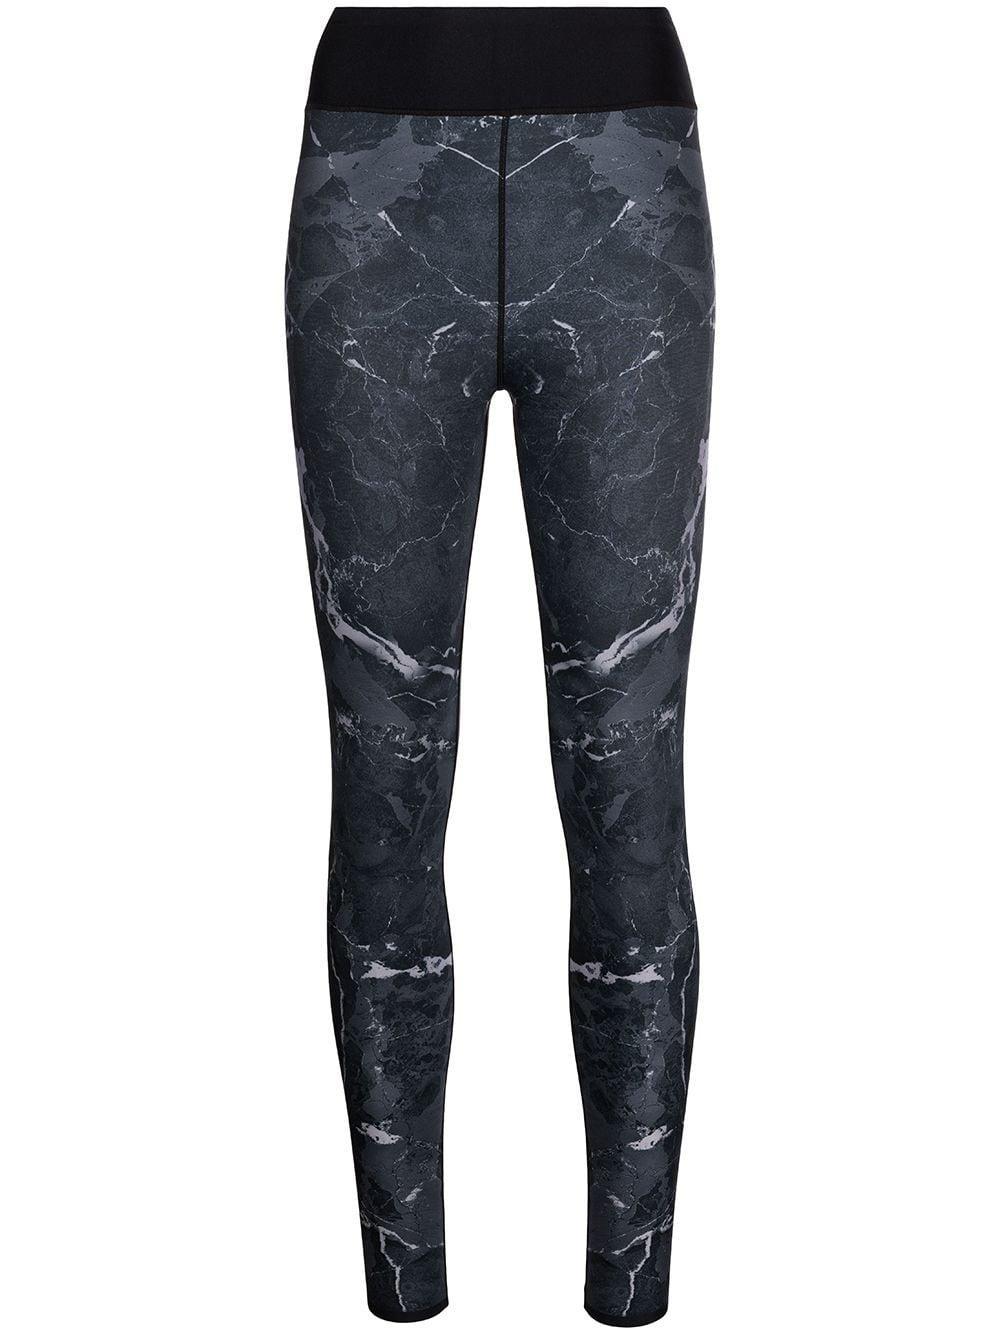 Granite Print Ankle Leggings Item # A321POR302SLKB-H